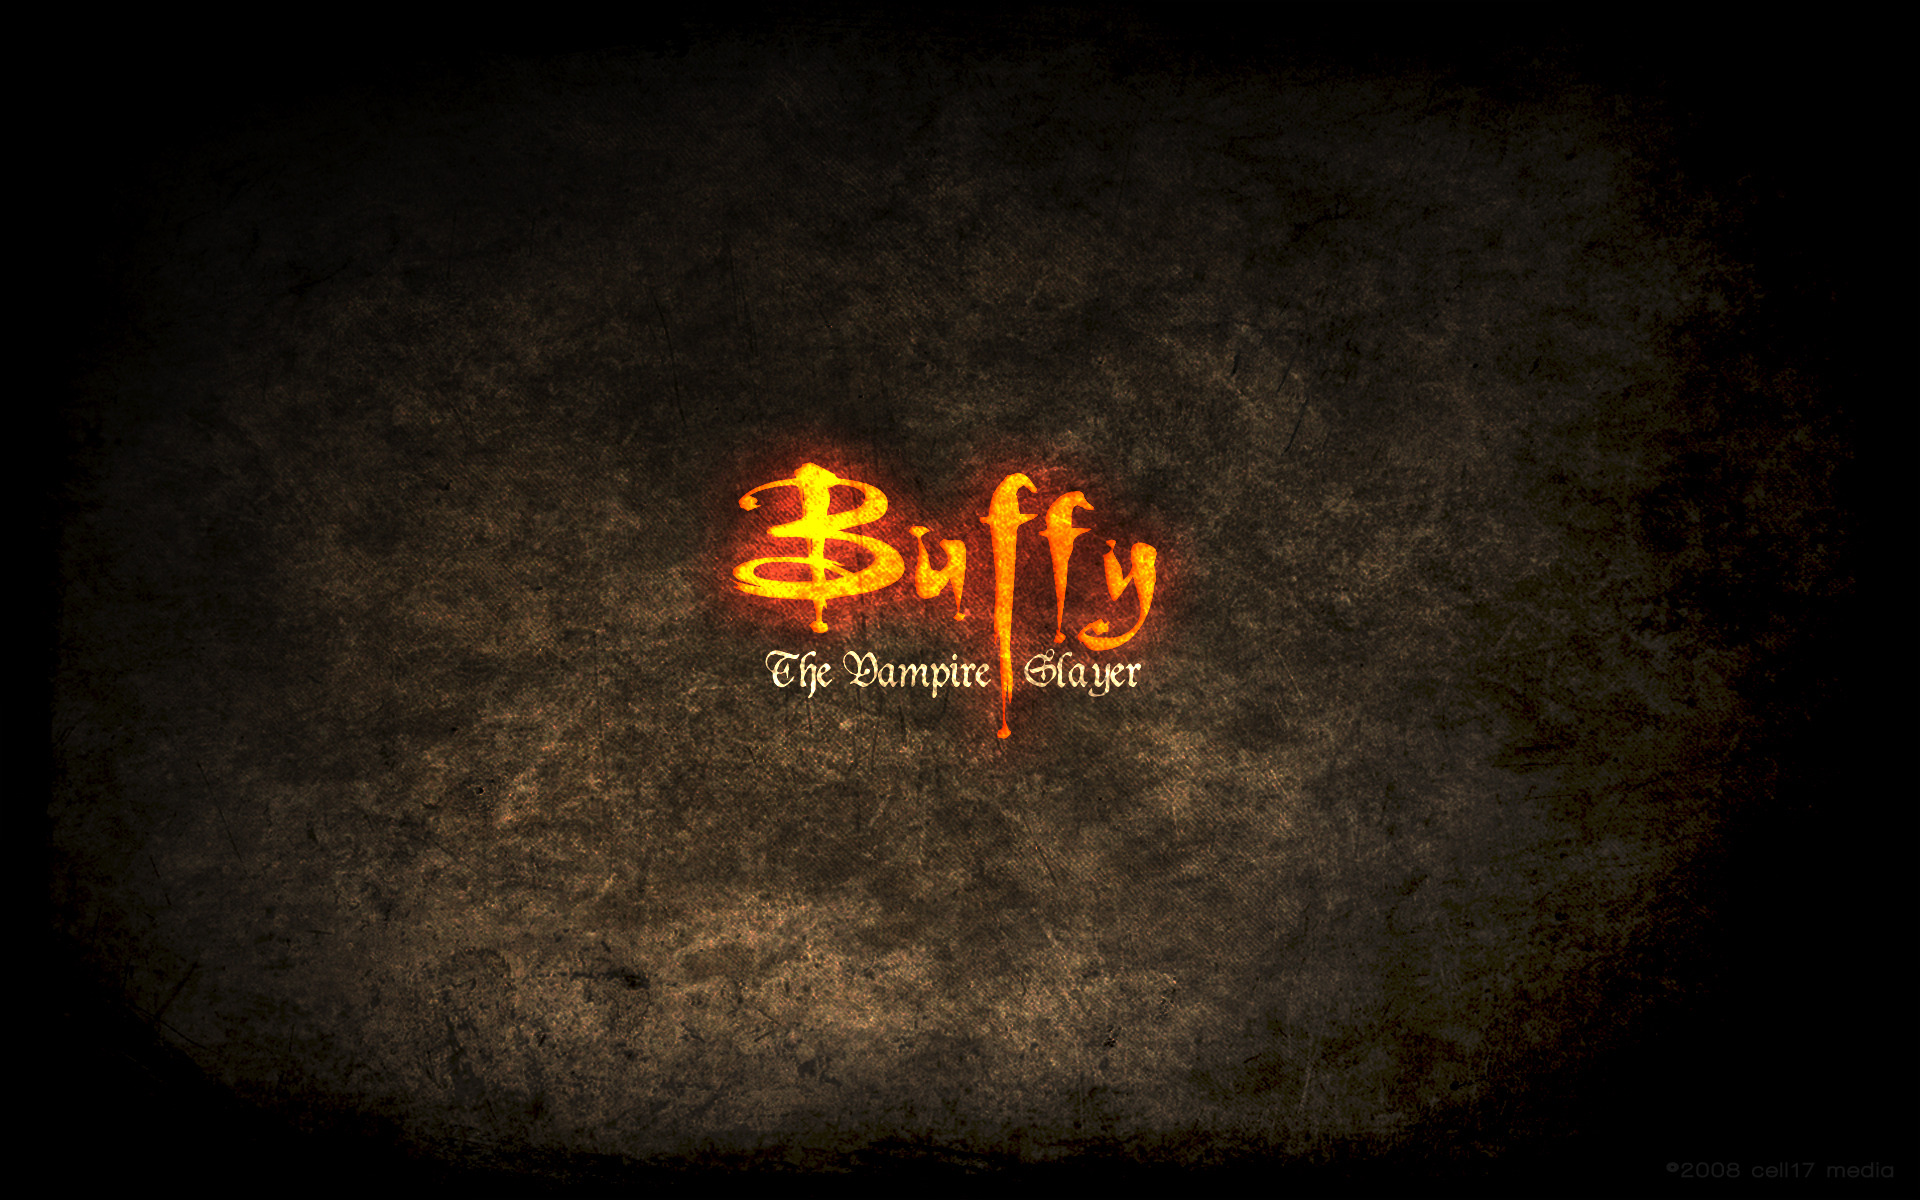 Buffy the Vampire Slayer wallpaper 5878 1920x1200